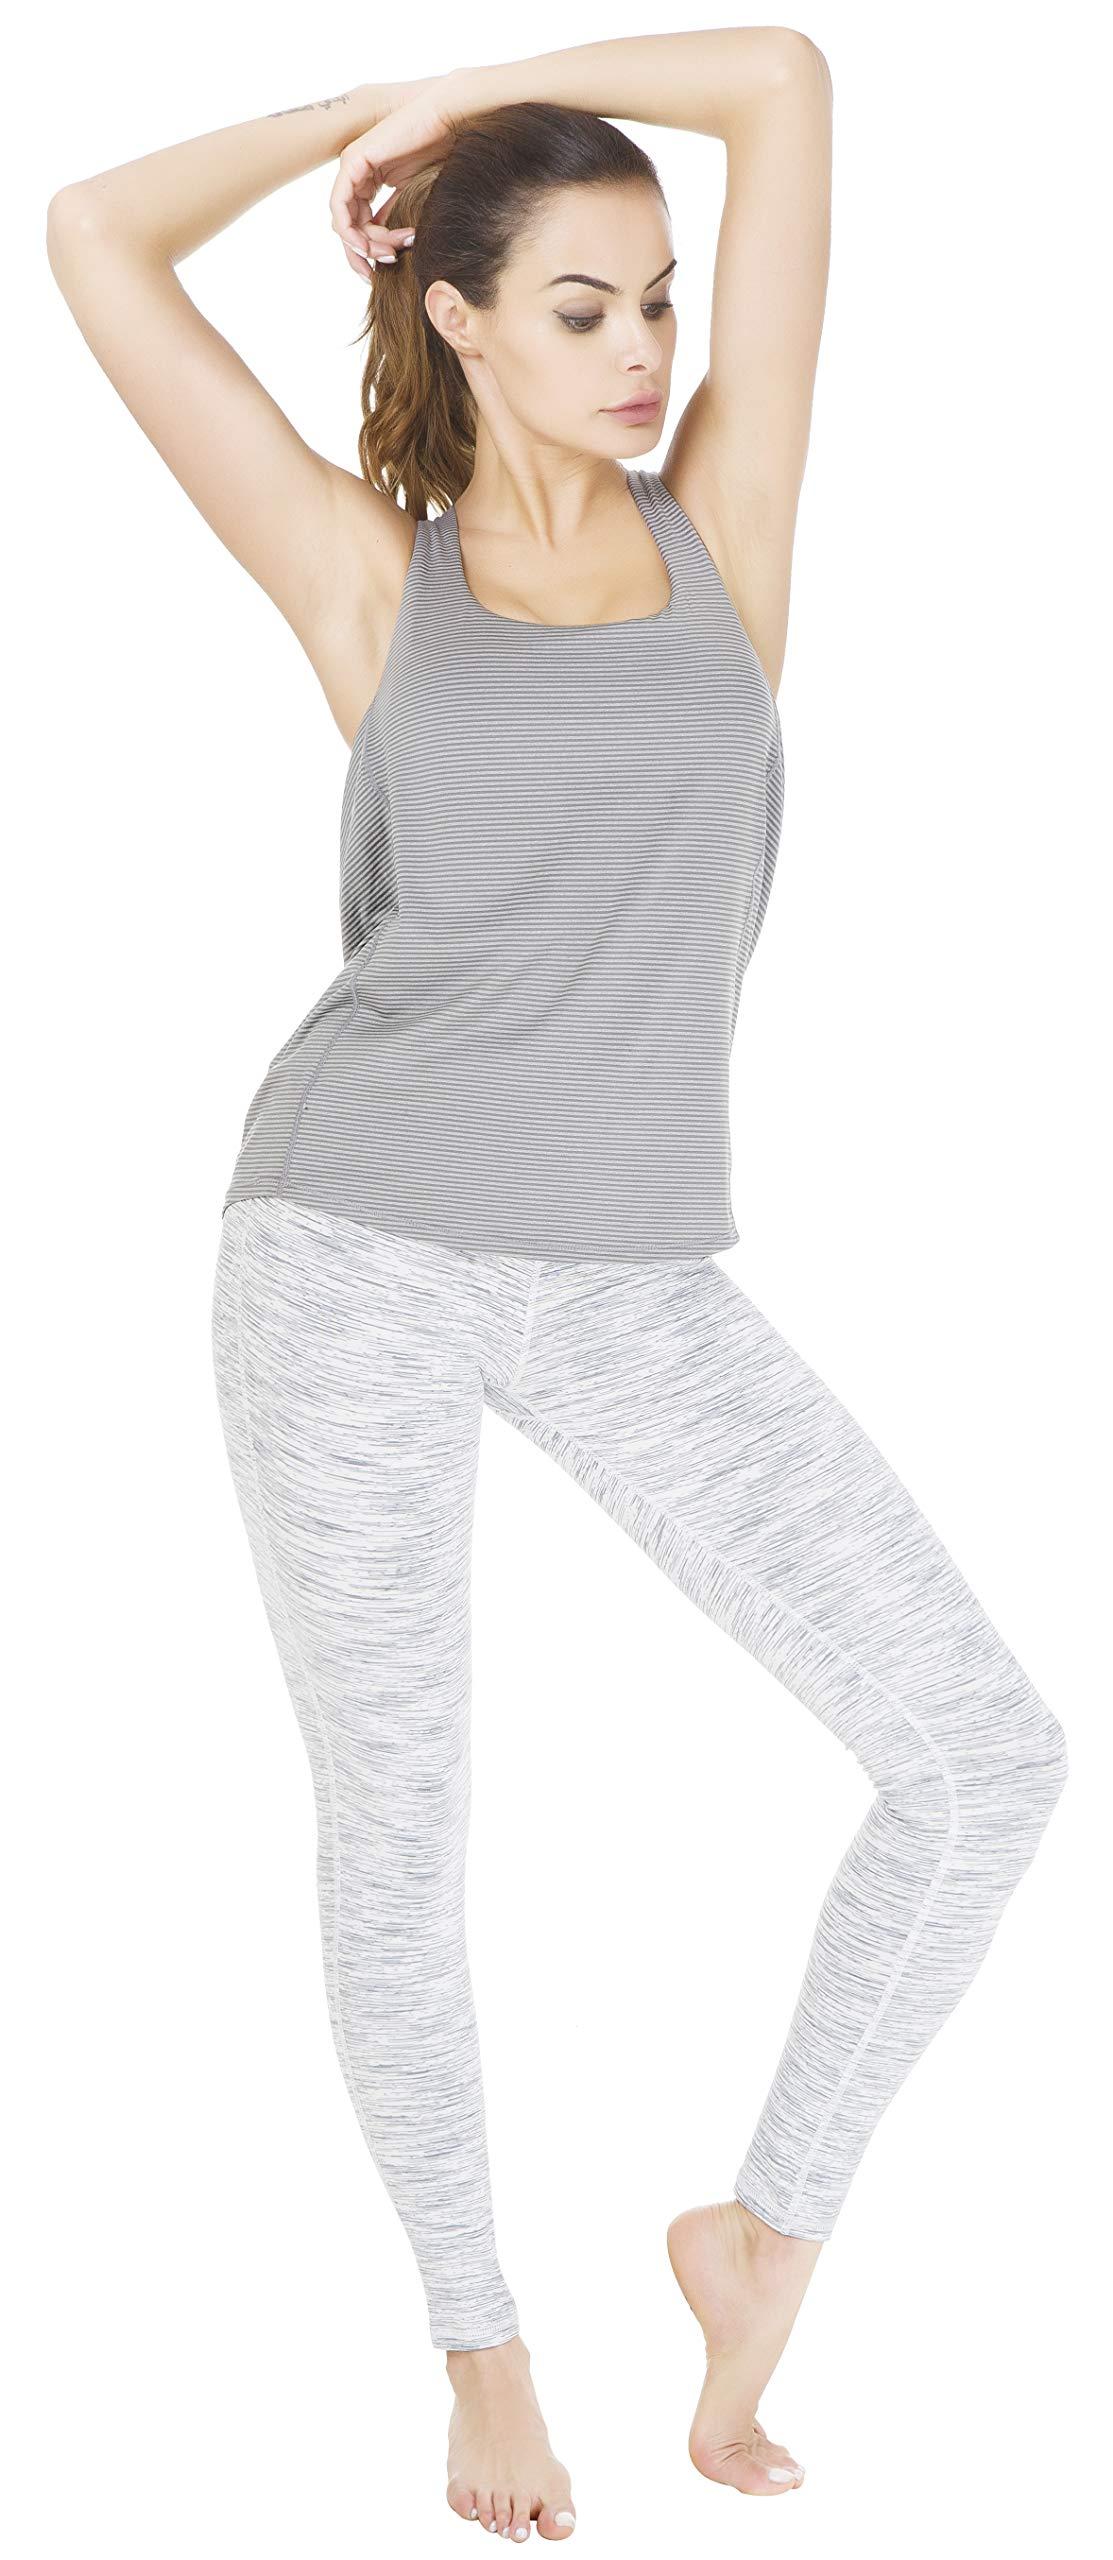 059d101988c7d Queenie Ke Women Power Flex Yoga Pants Workout Running Leggings Size S  Color White Grey Space Dye Long